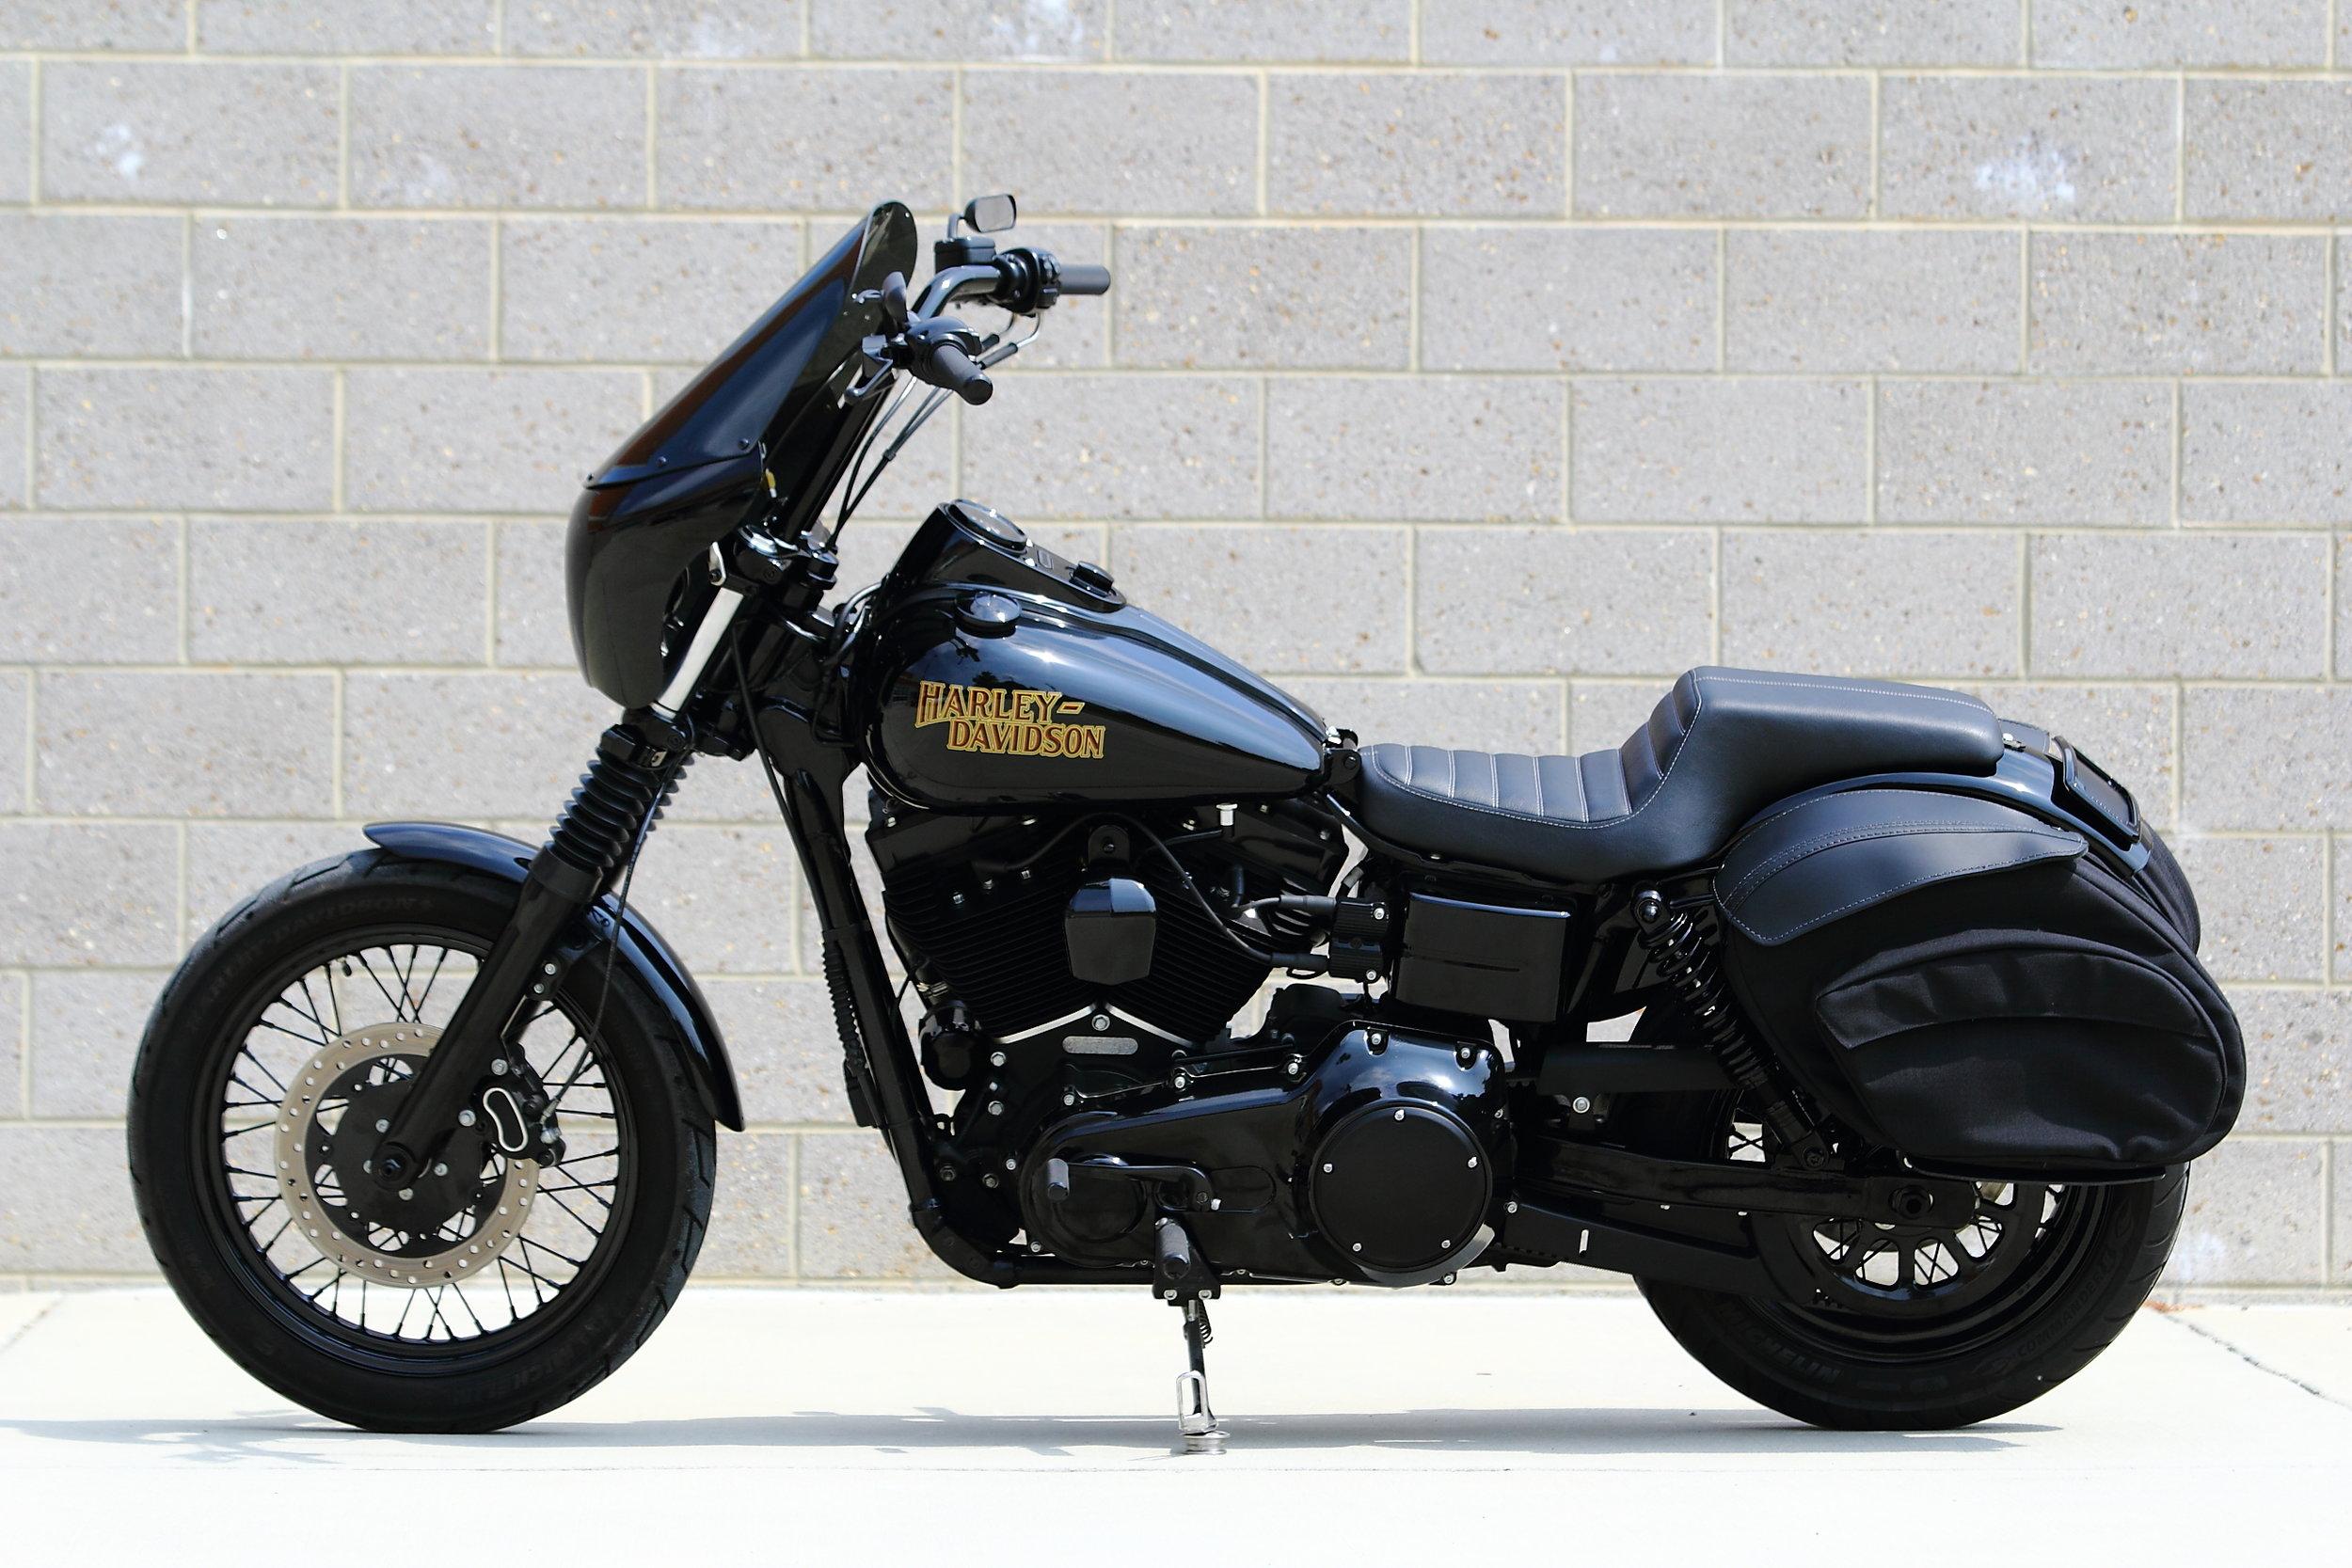 2016 Harley Davidson Dyna Street Bob - Club Style Build — SOUTHEAST CUSTOM  CYCLES